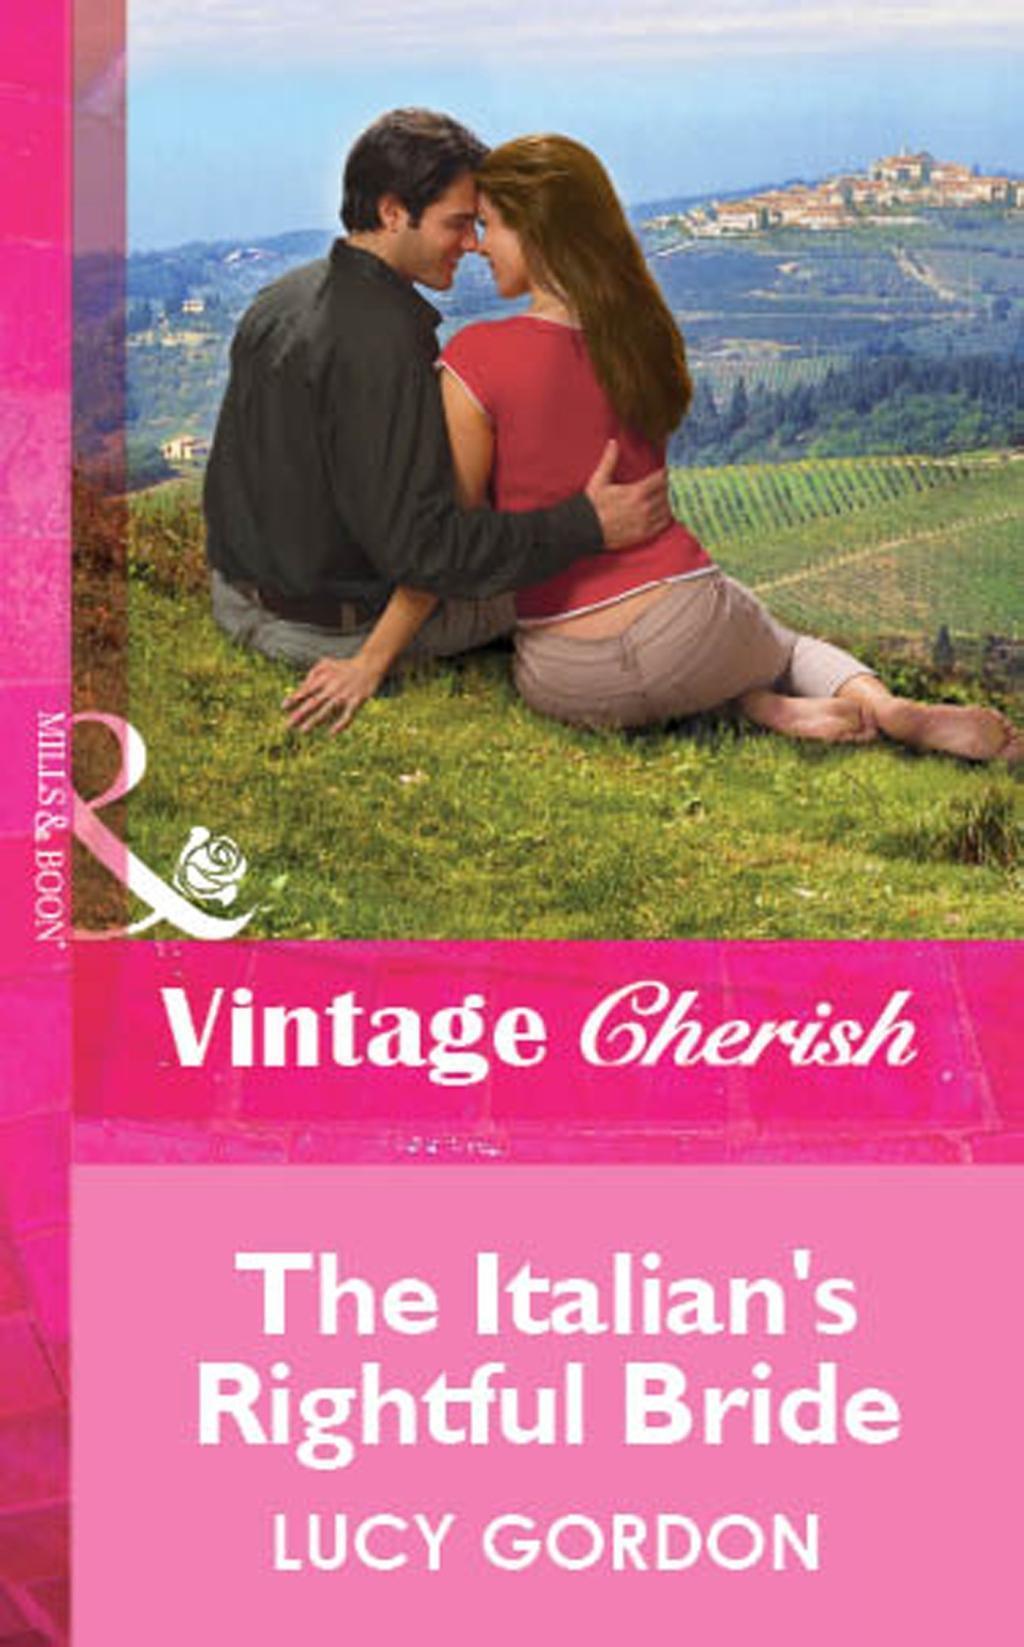 The Italian's Rightful Bride (Mills & Boon Cherish)